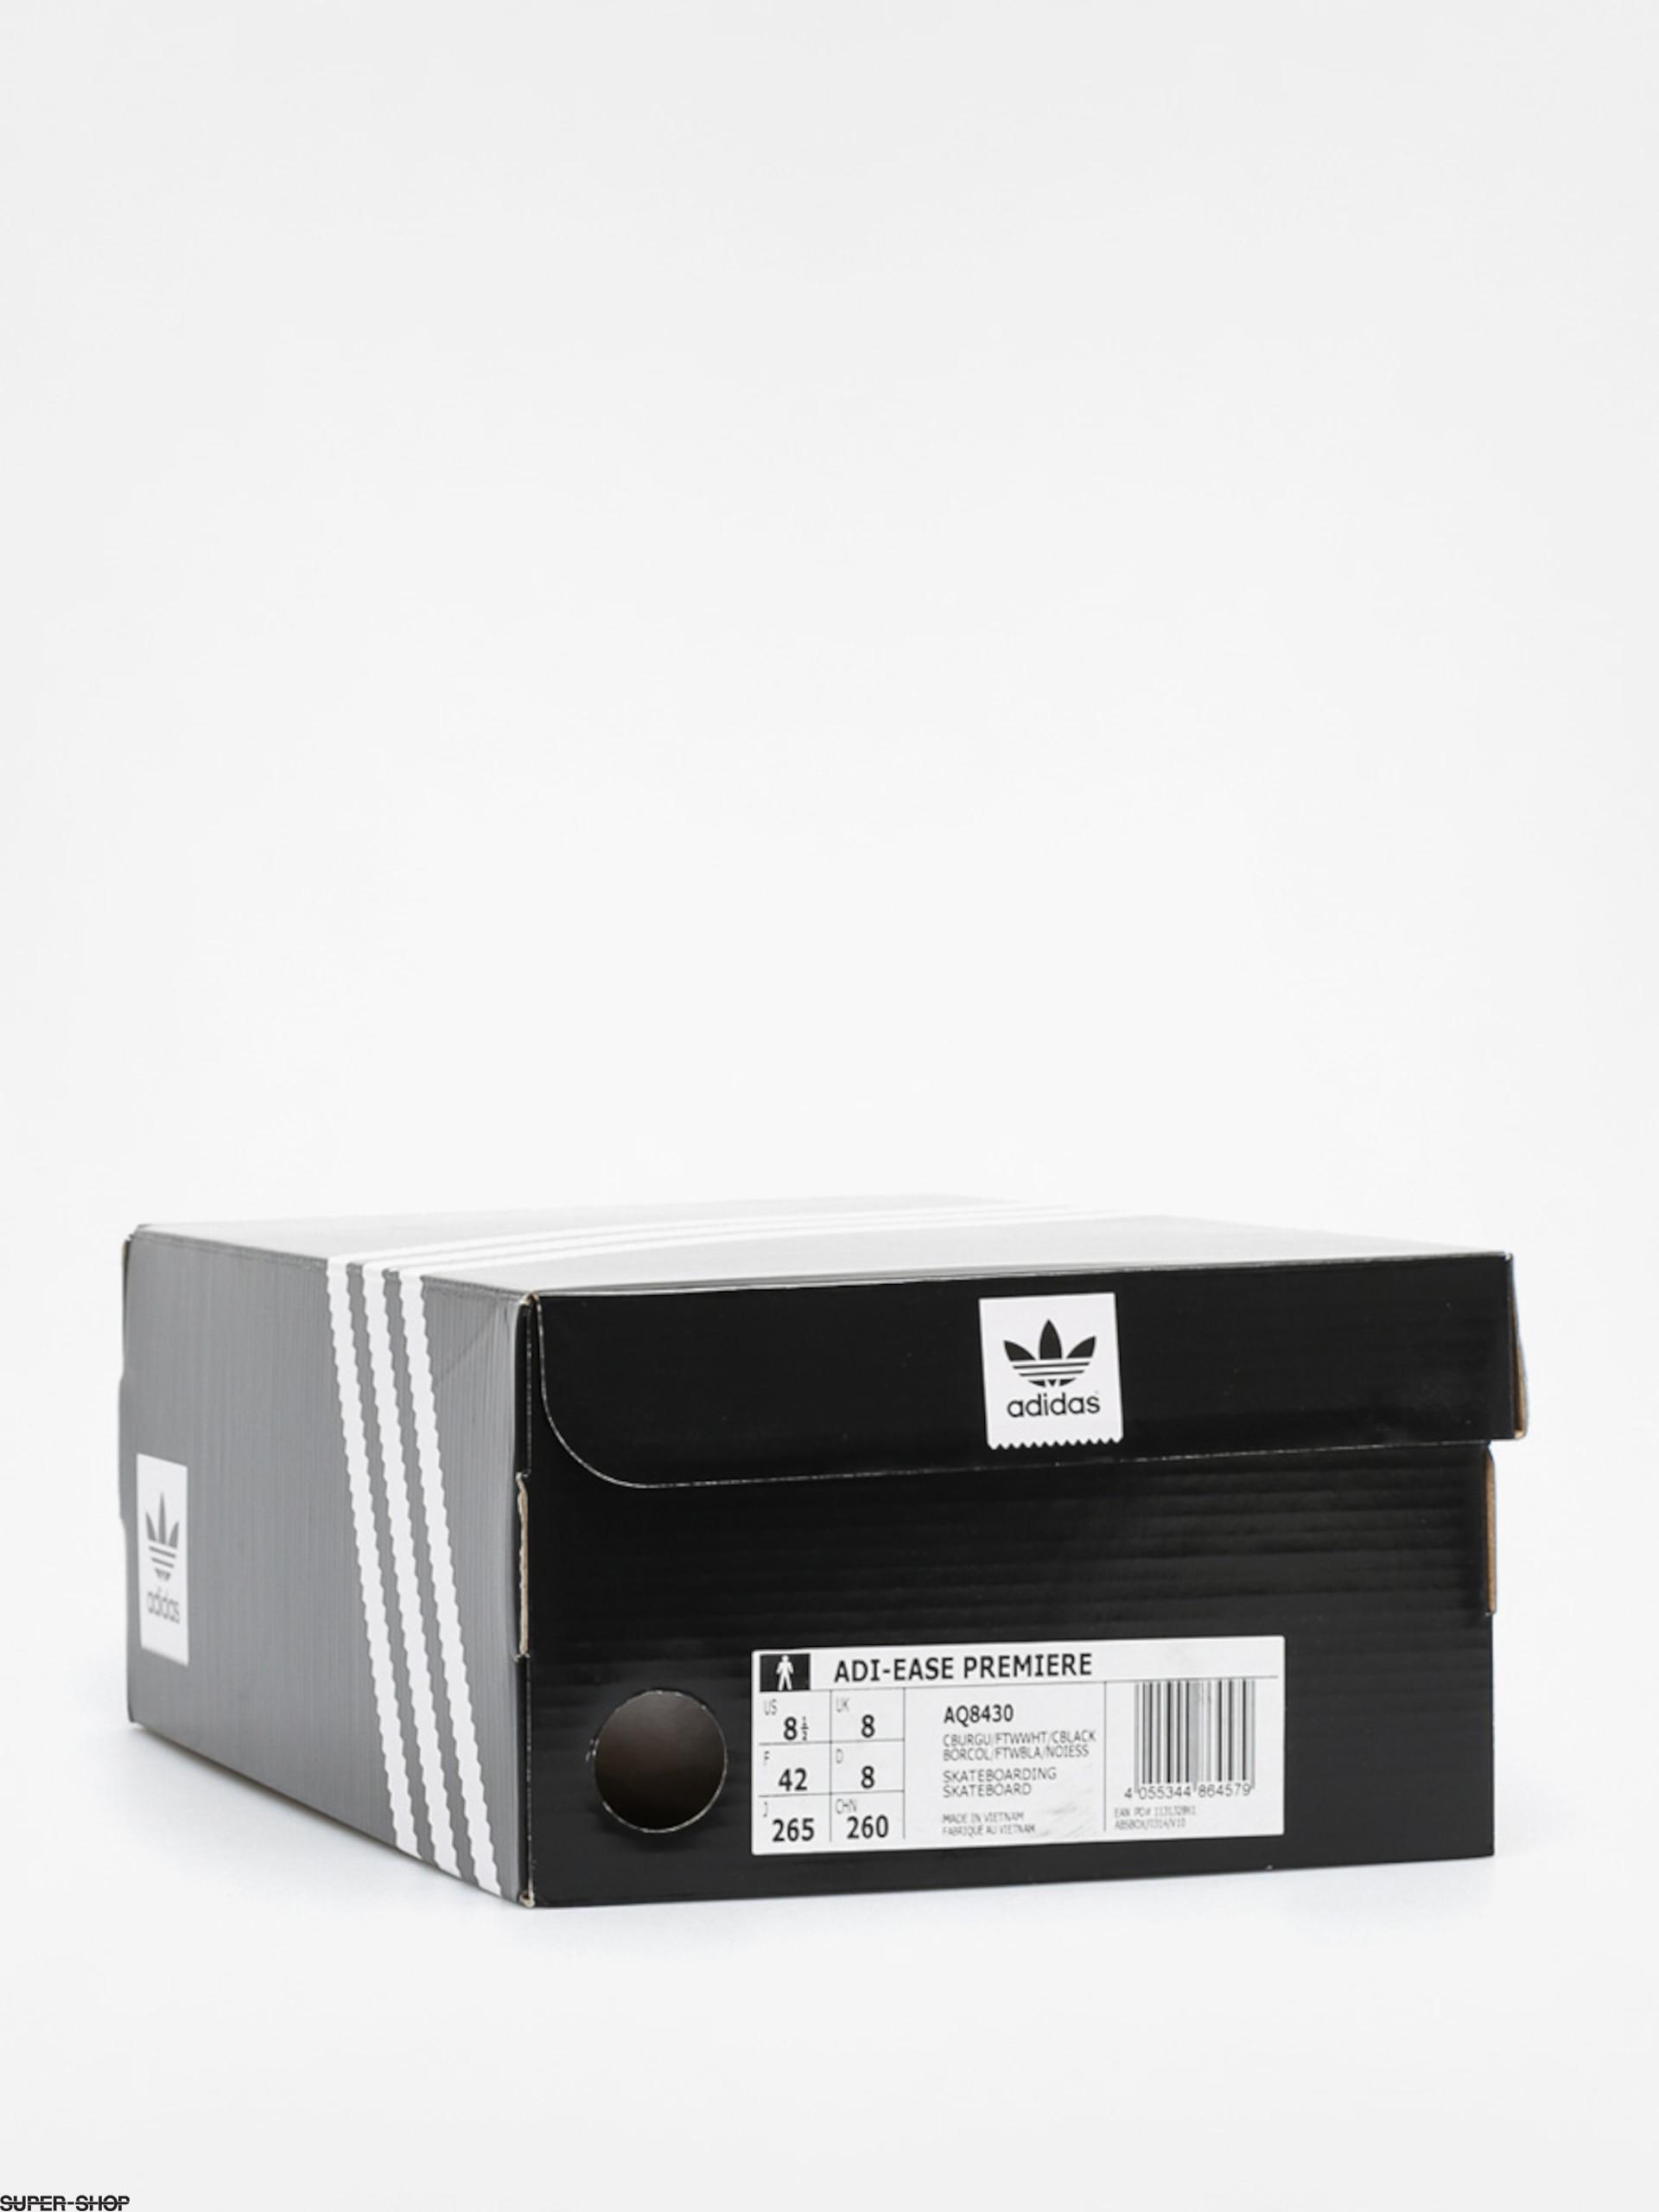 Zapatillas adidas Adi Ease Premiere (cburgu / ftwwht / cblack)